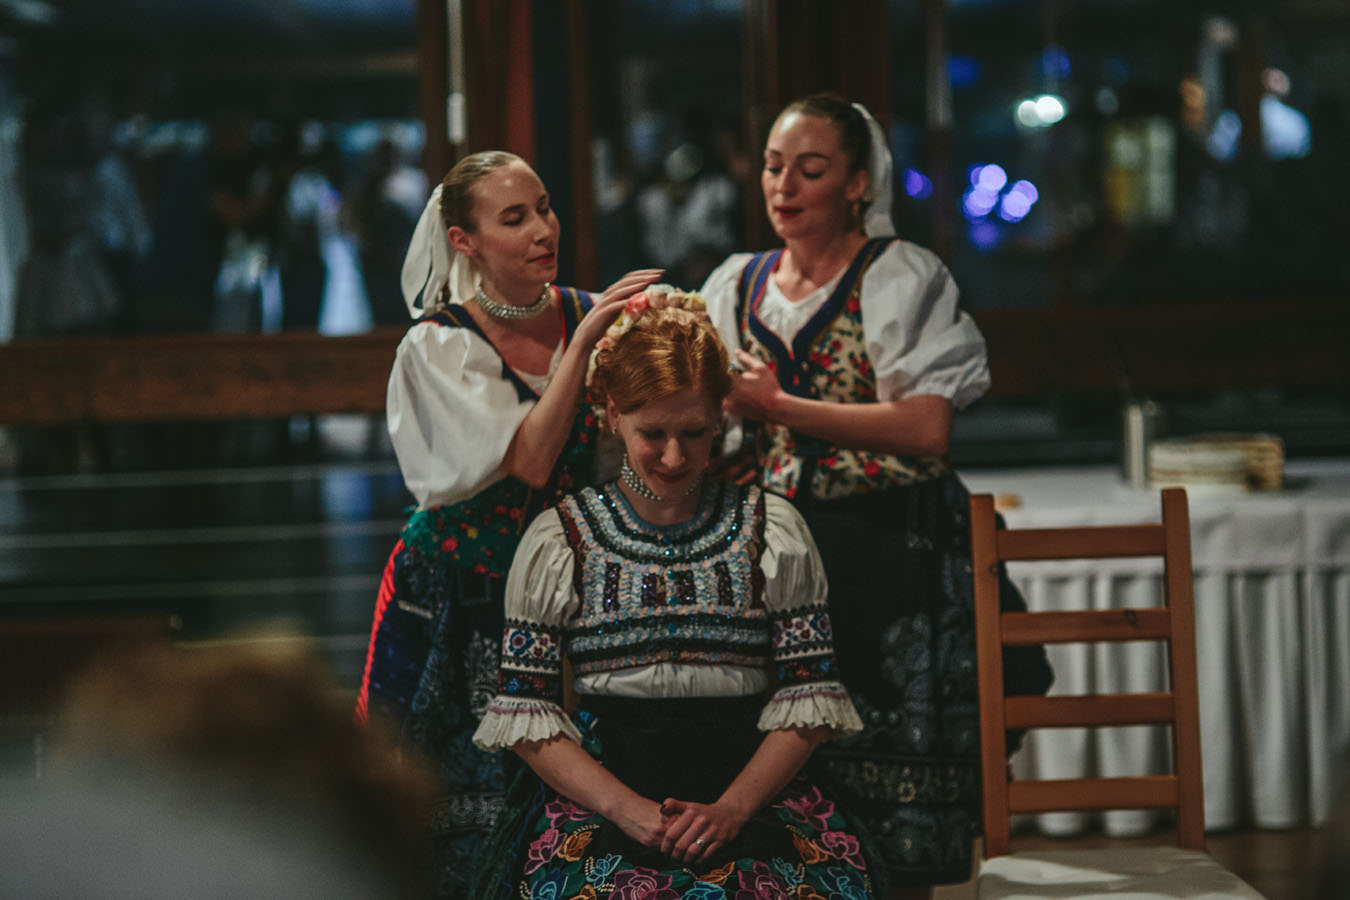 Svadba bratislava nitra tatry 160